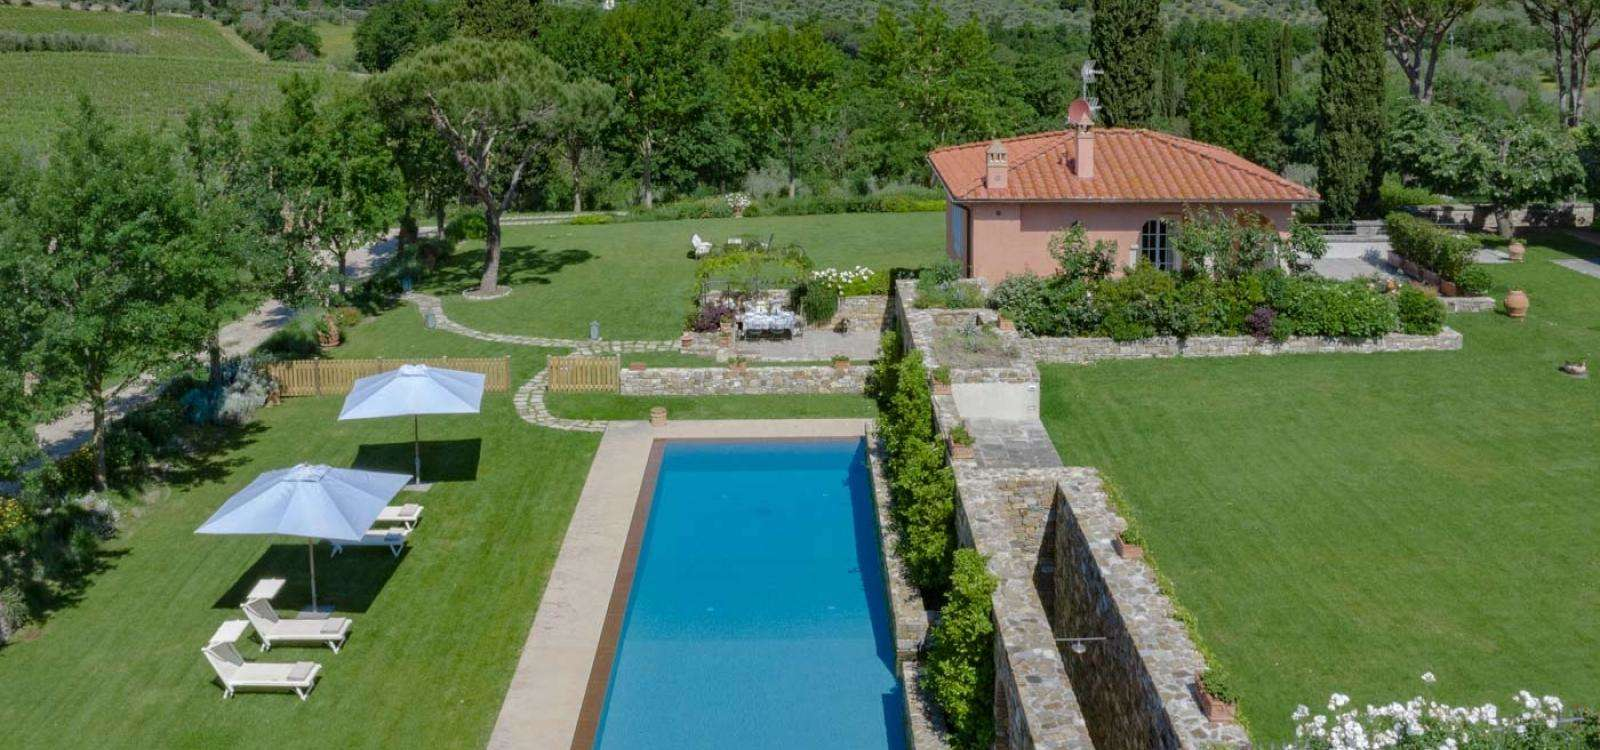 Luxury vacation rentals europe - Italy - Tuscany - Florence - Pulcra - Image 1/18